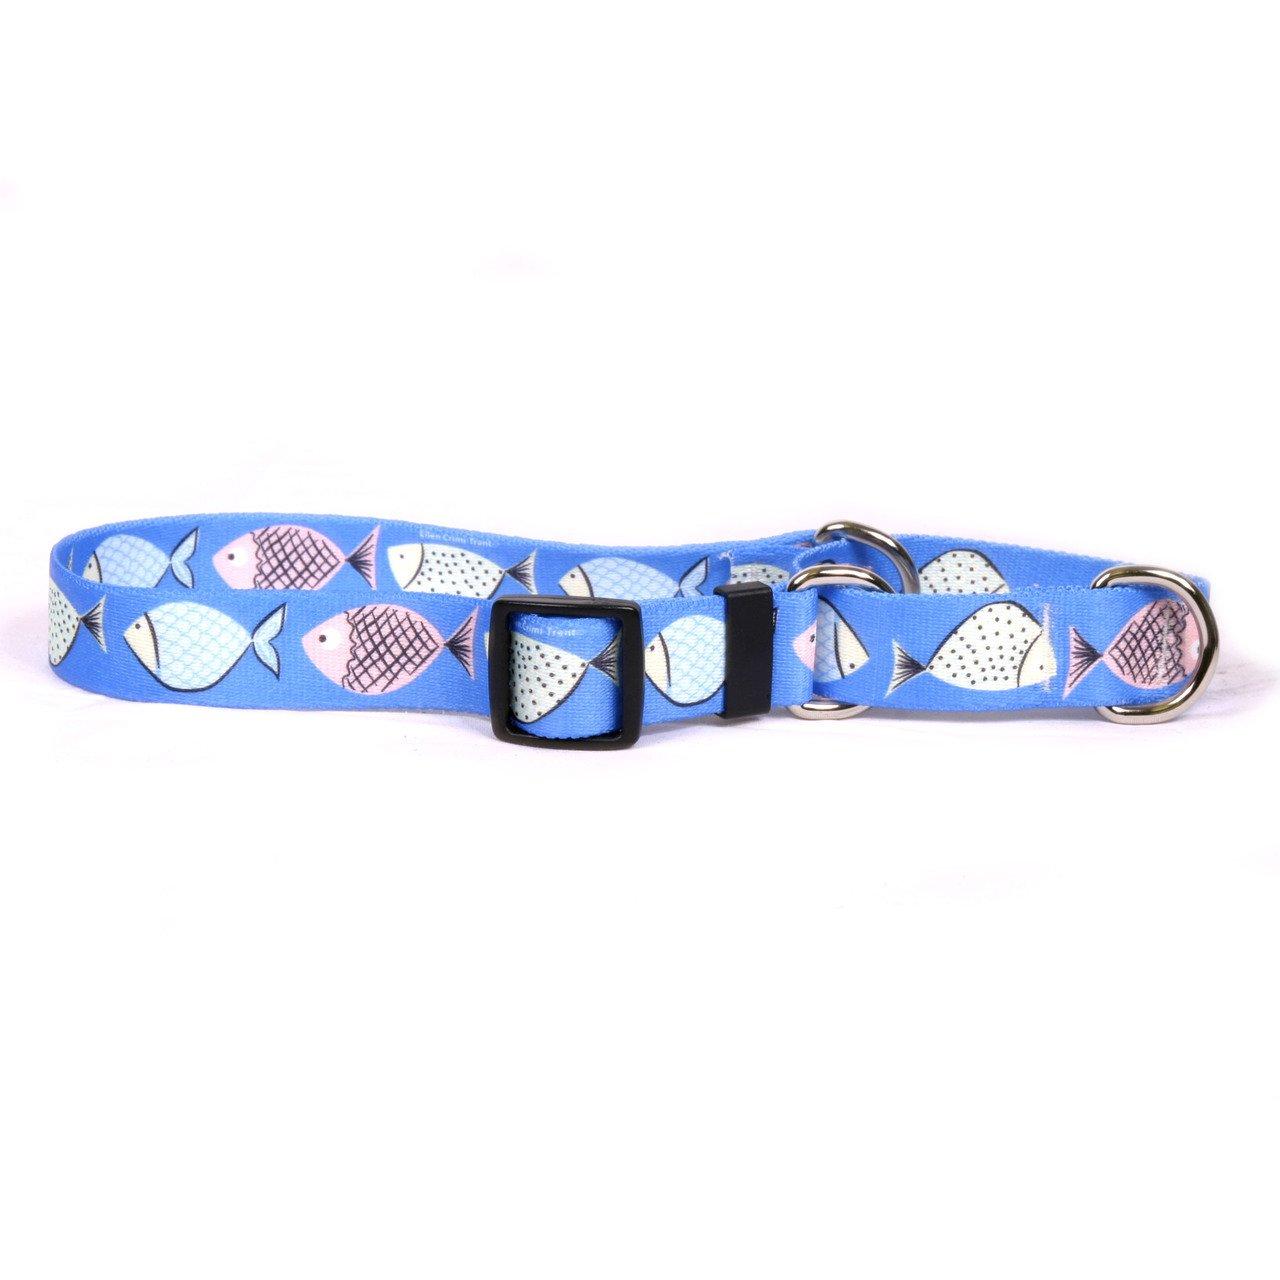 Yellow Dog Design Martingale Slip Collar, Go Fish, Large 27'' by Yellow Dog Design (Image #1)